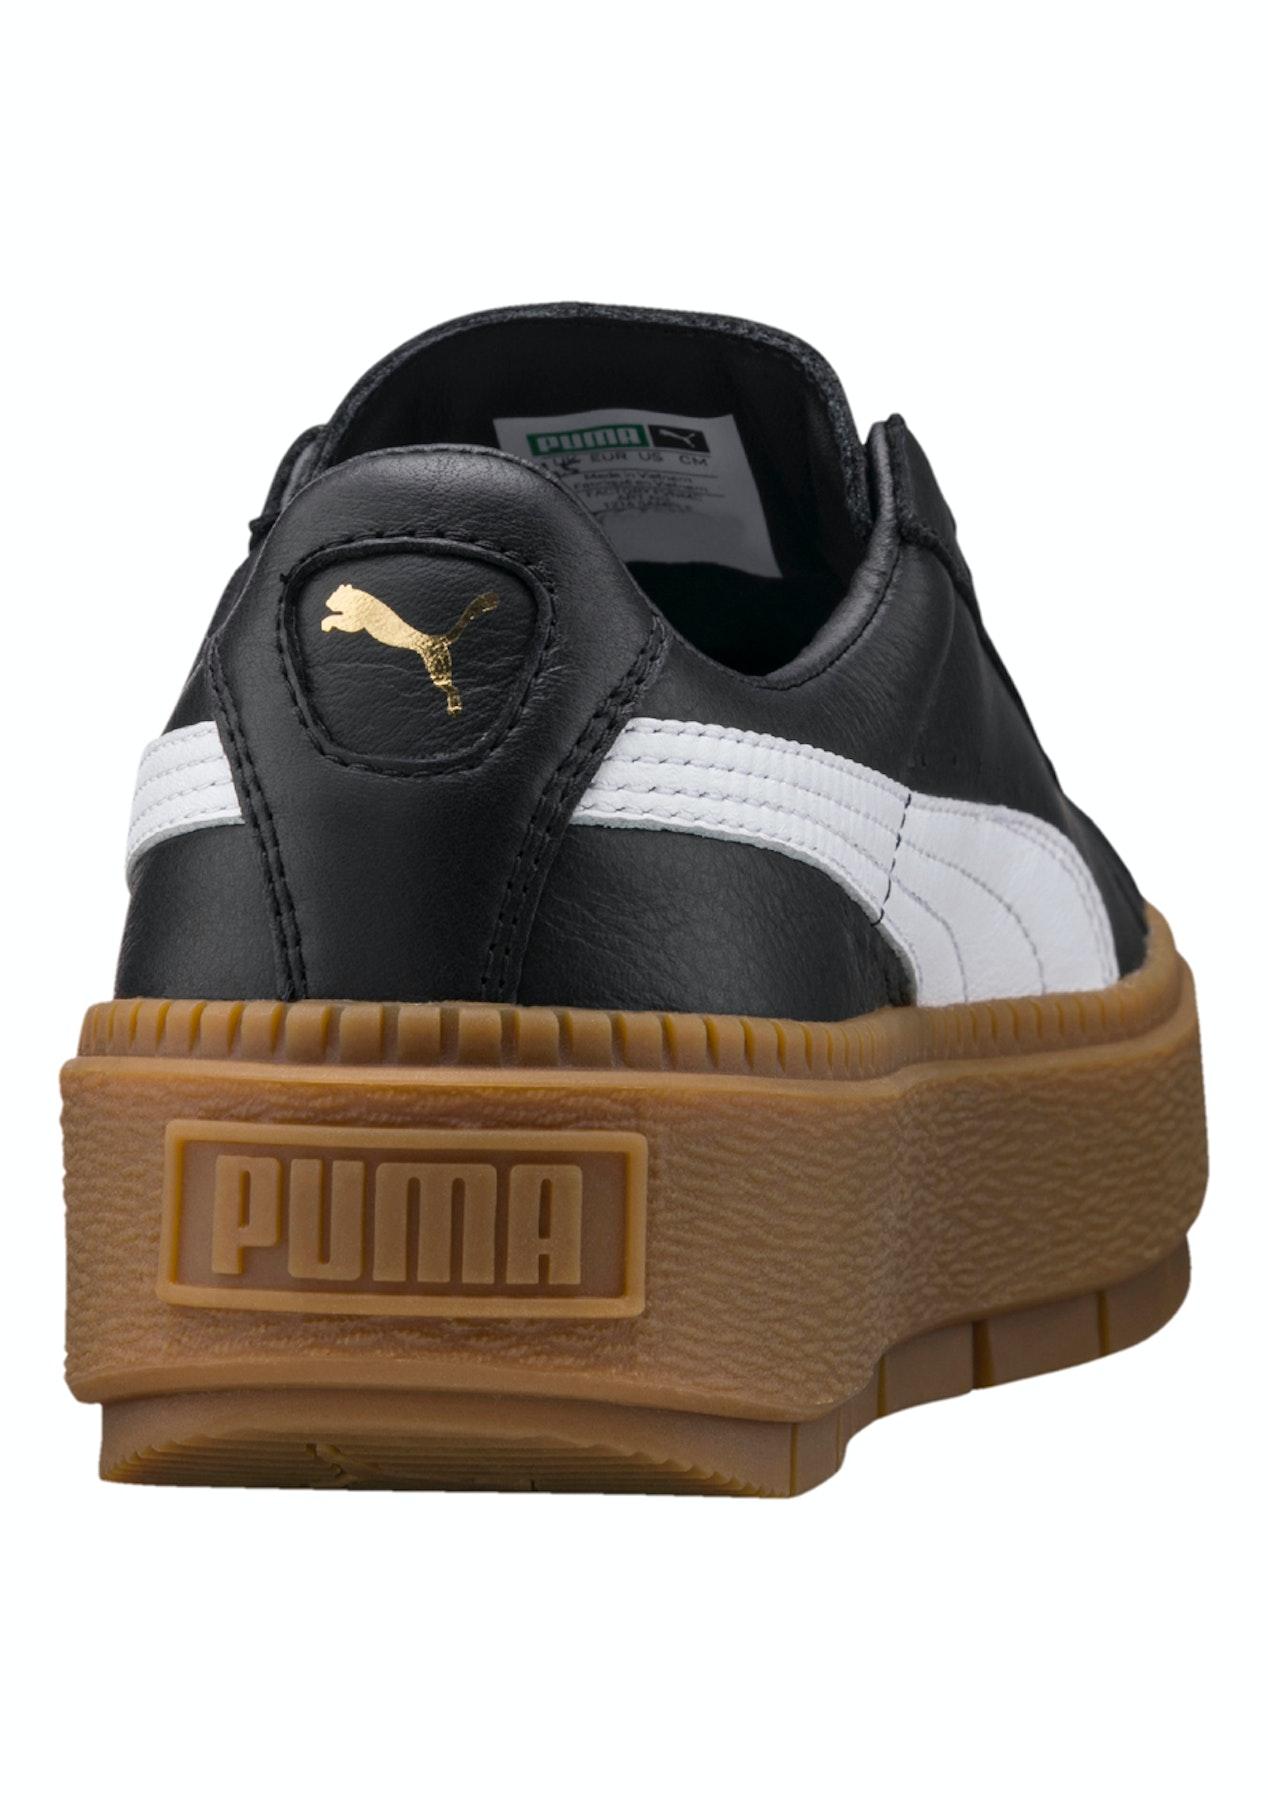 9927ea58cb6dee Puma Womens - Basket Platform Trace - Black - White - Massive Puma Discounts  - Onceit